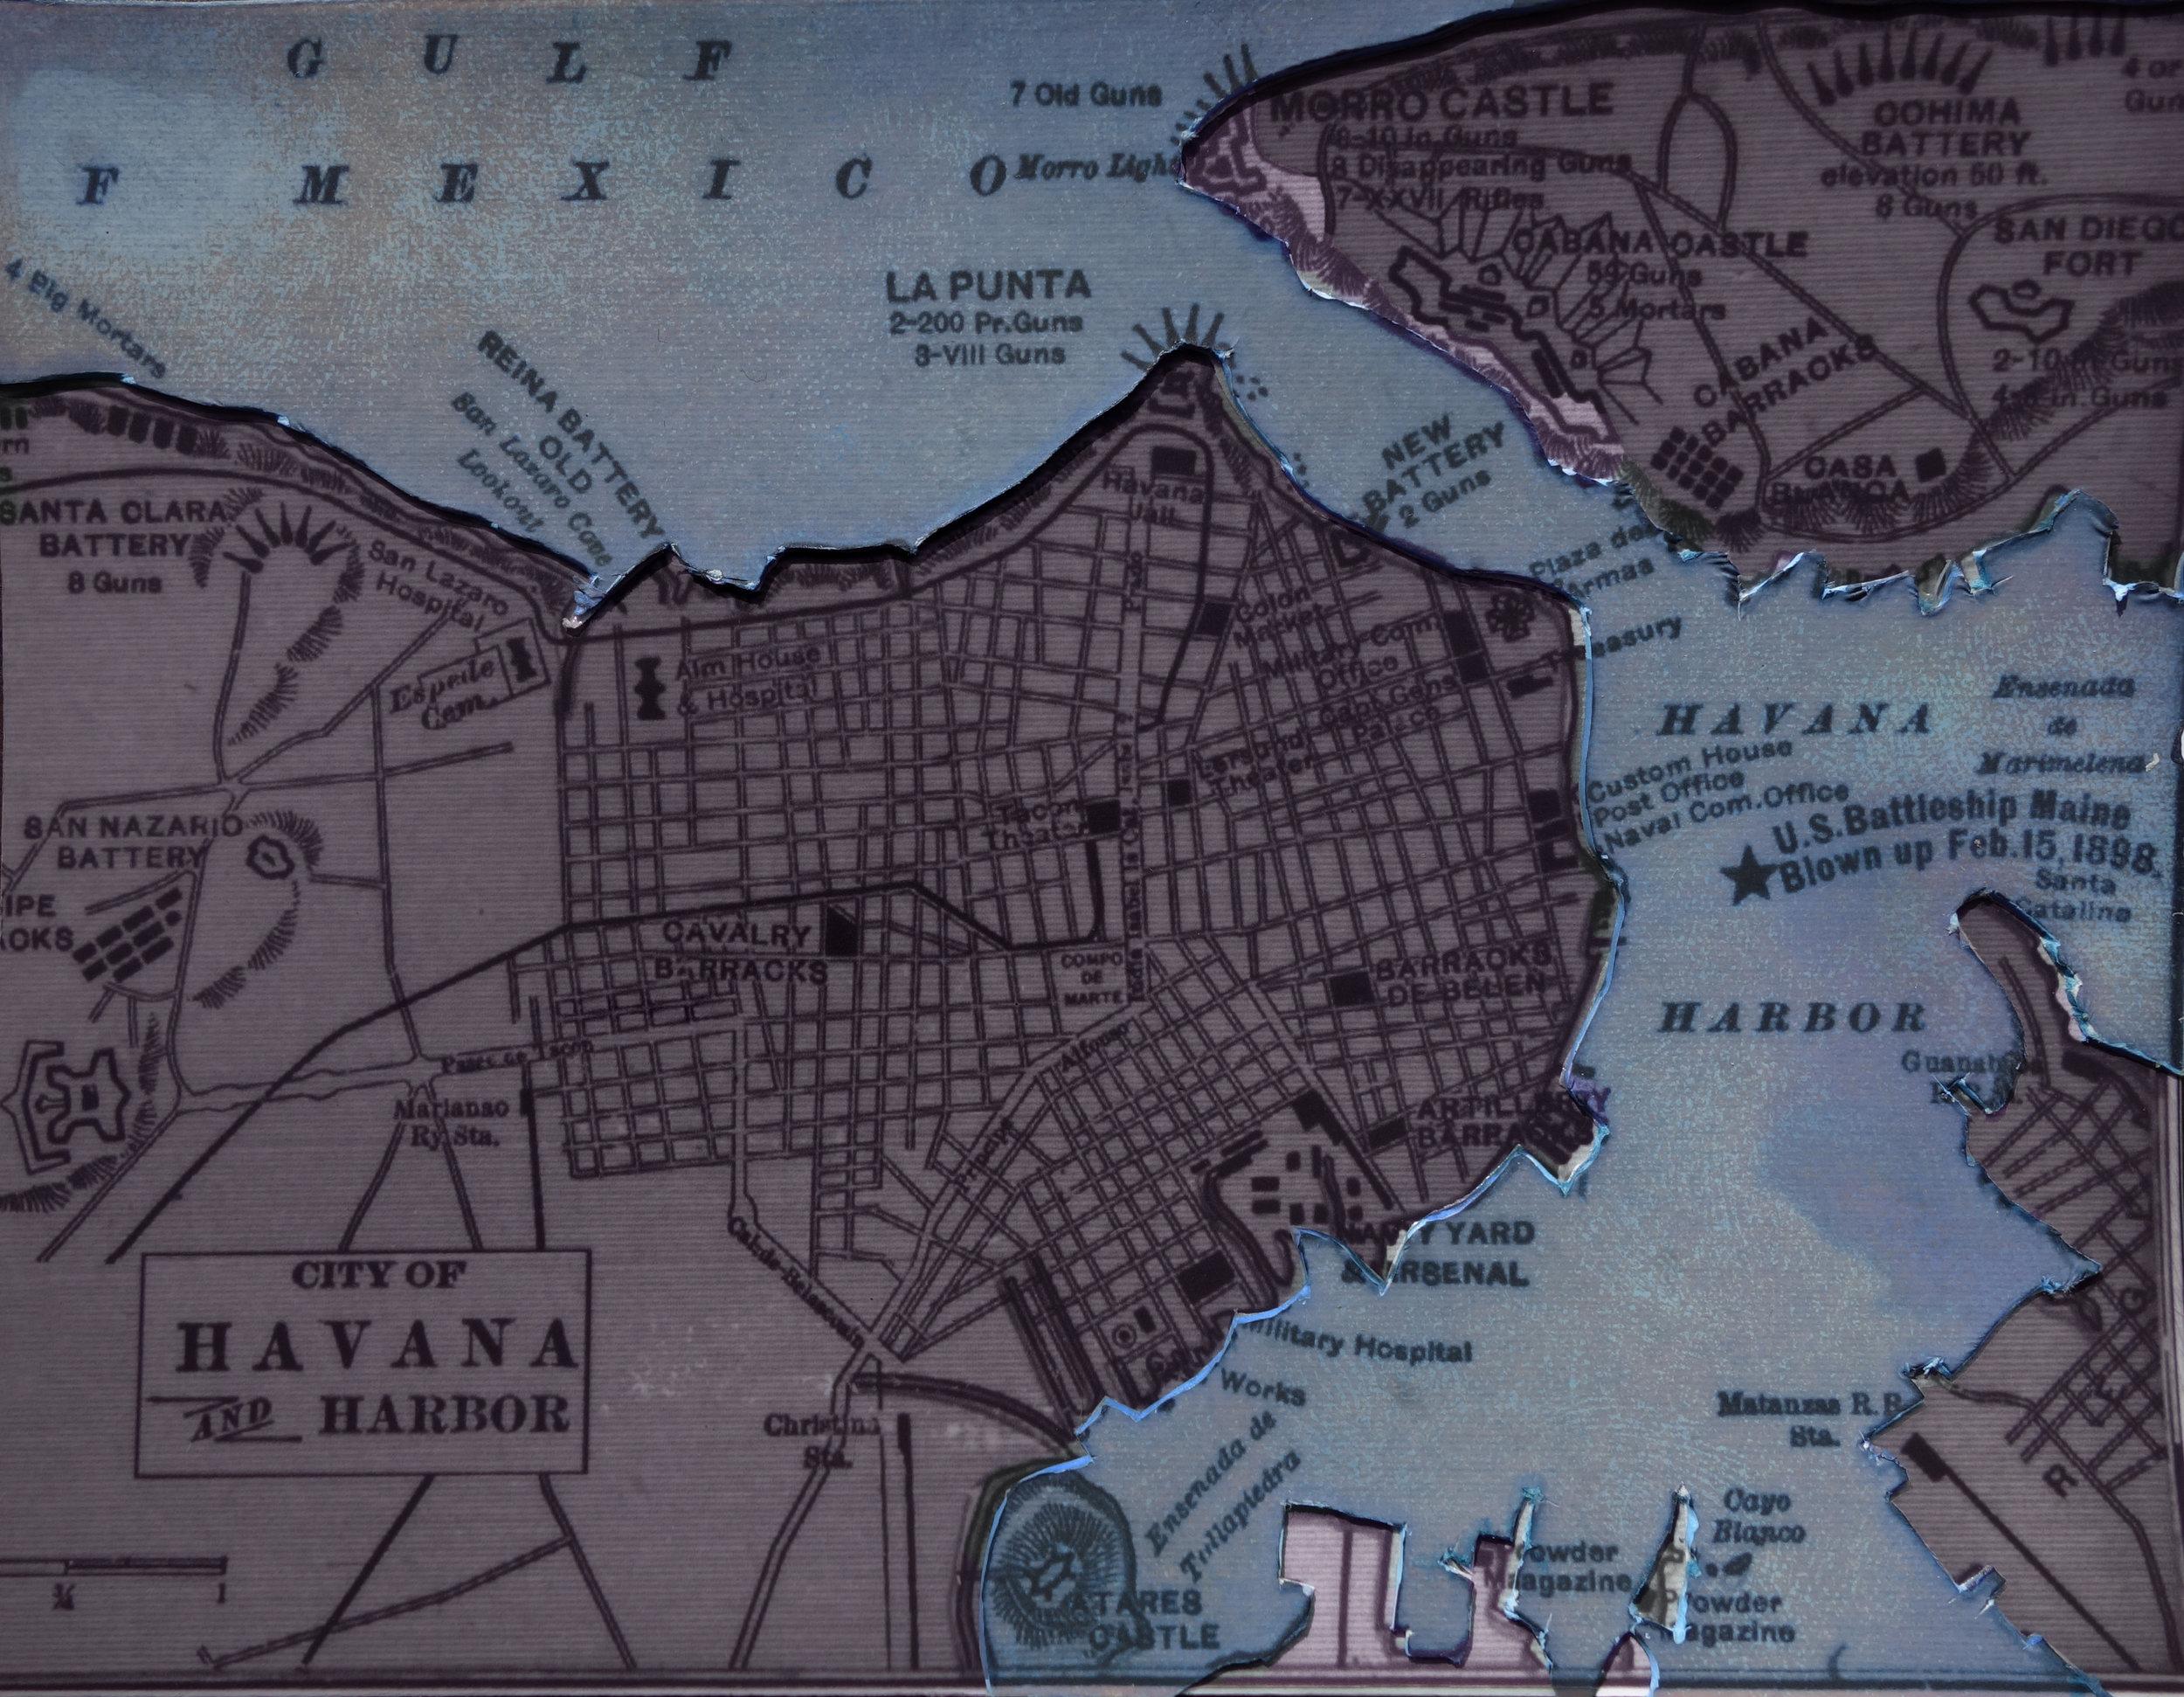 Havana #2